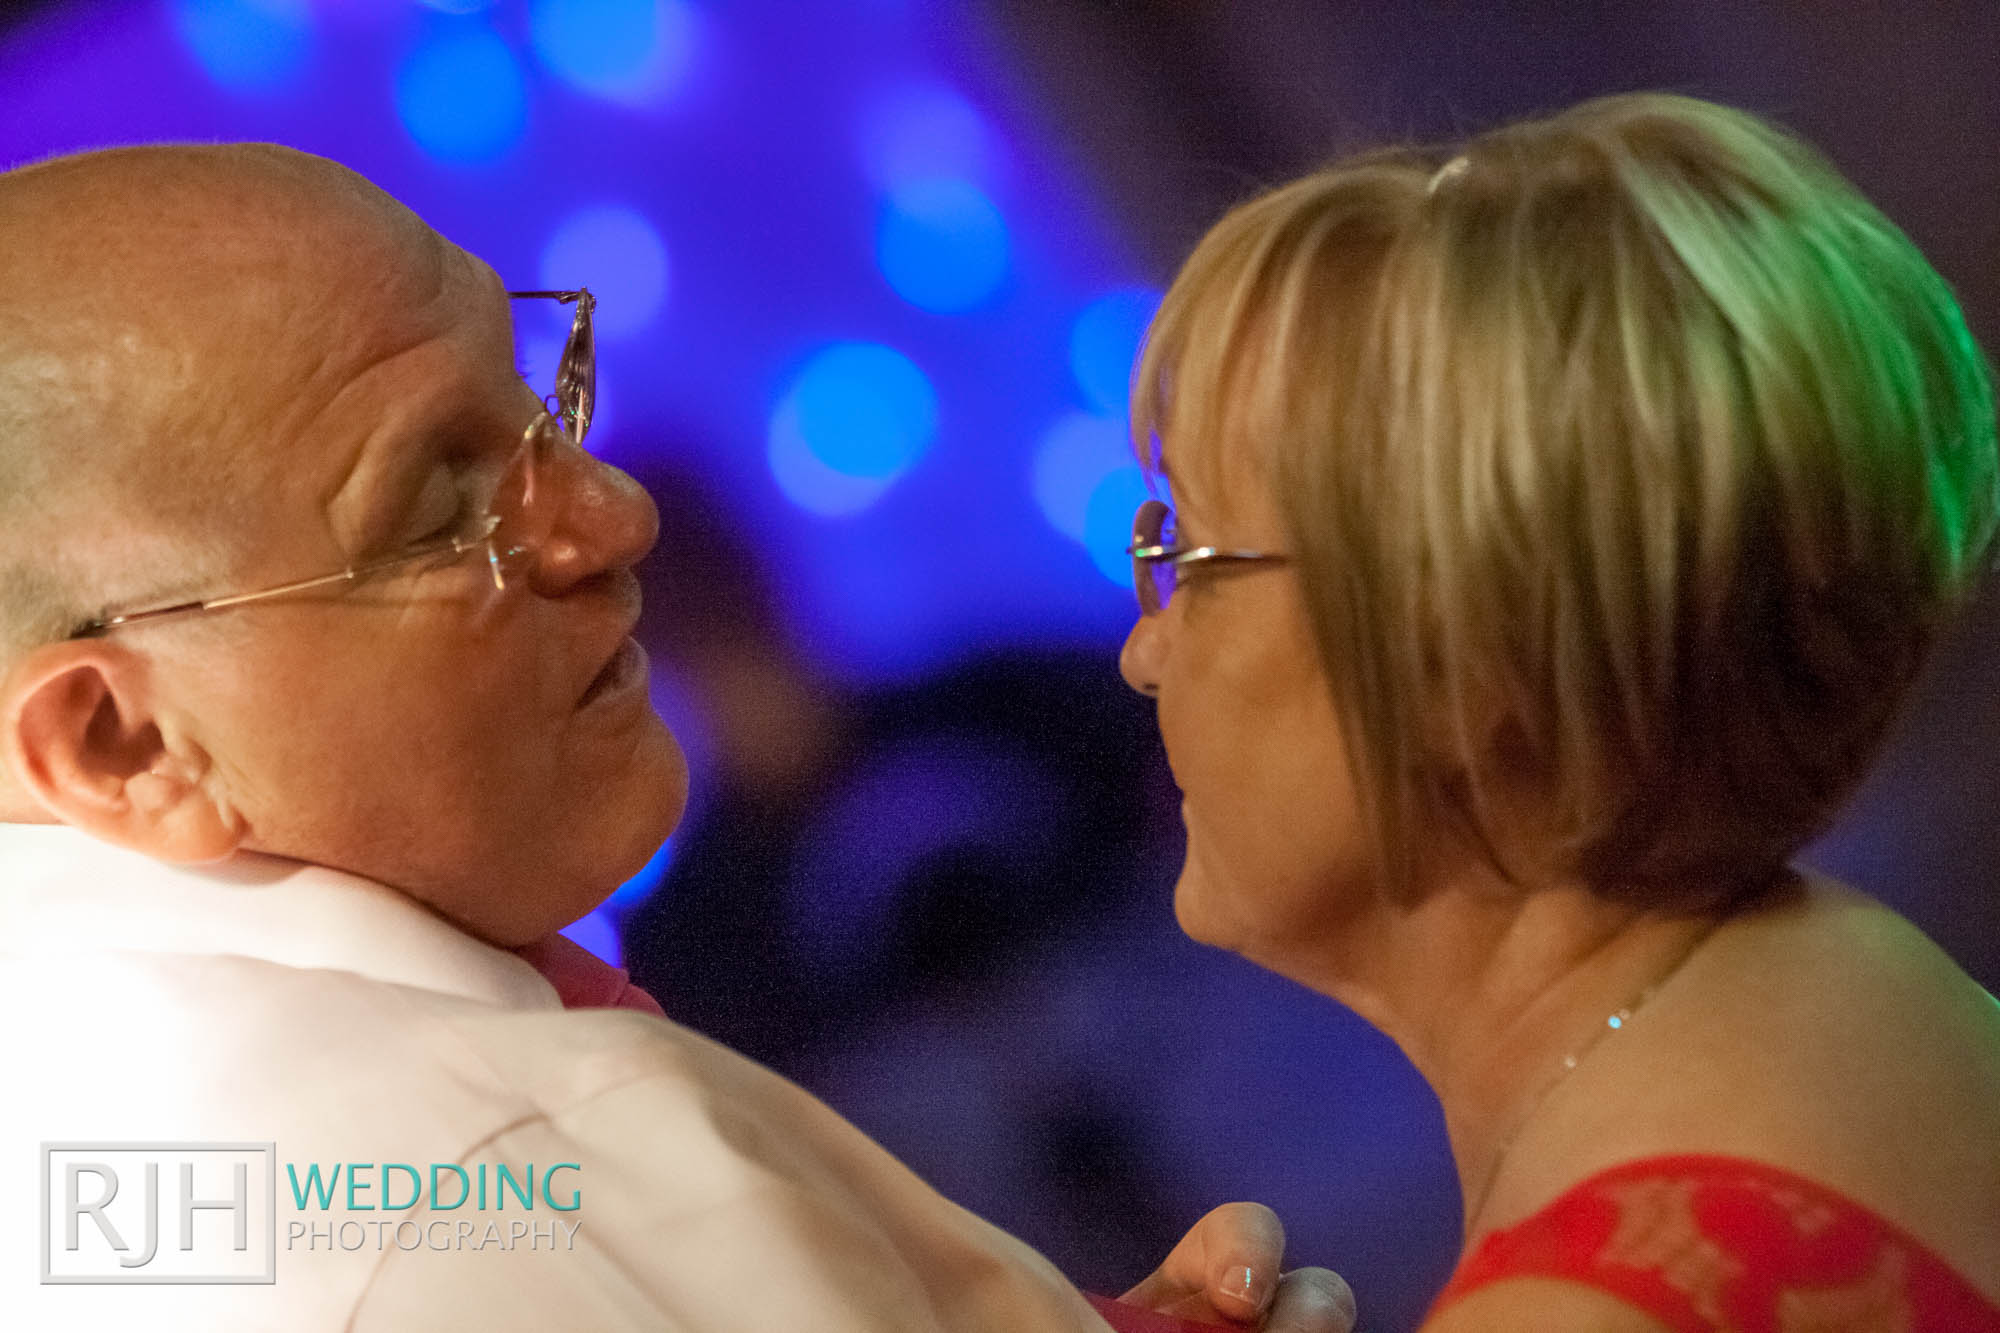 RJH Wedding Photography_2014 highlights_13.jpg